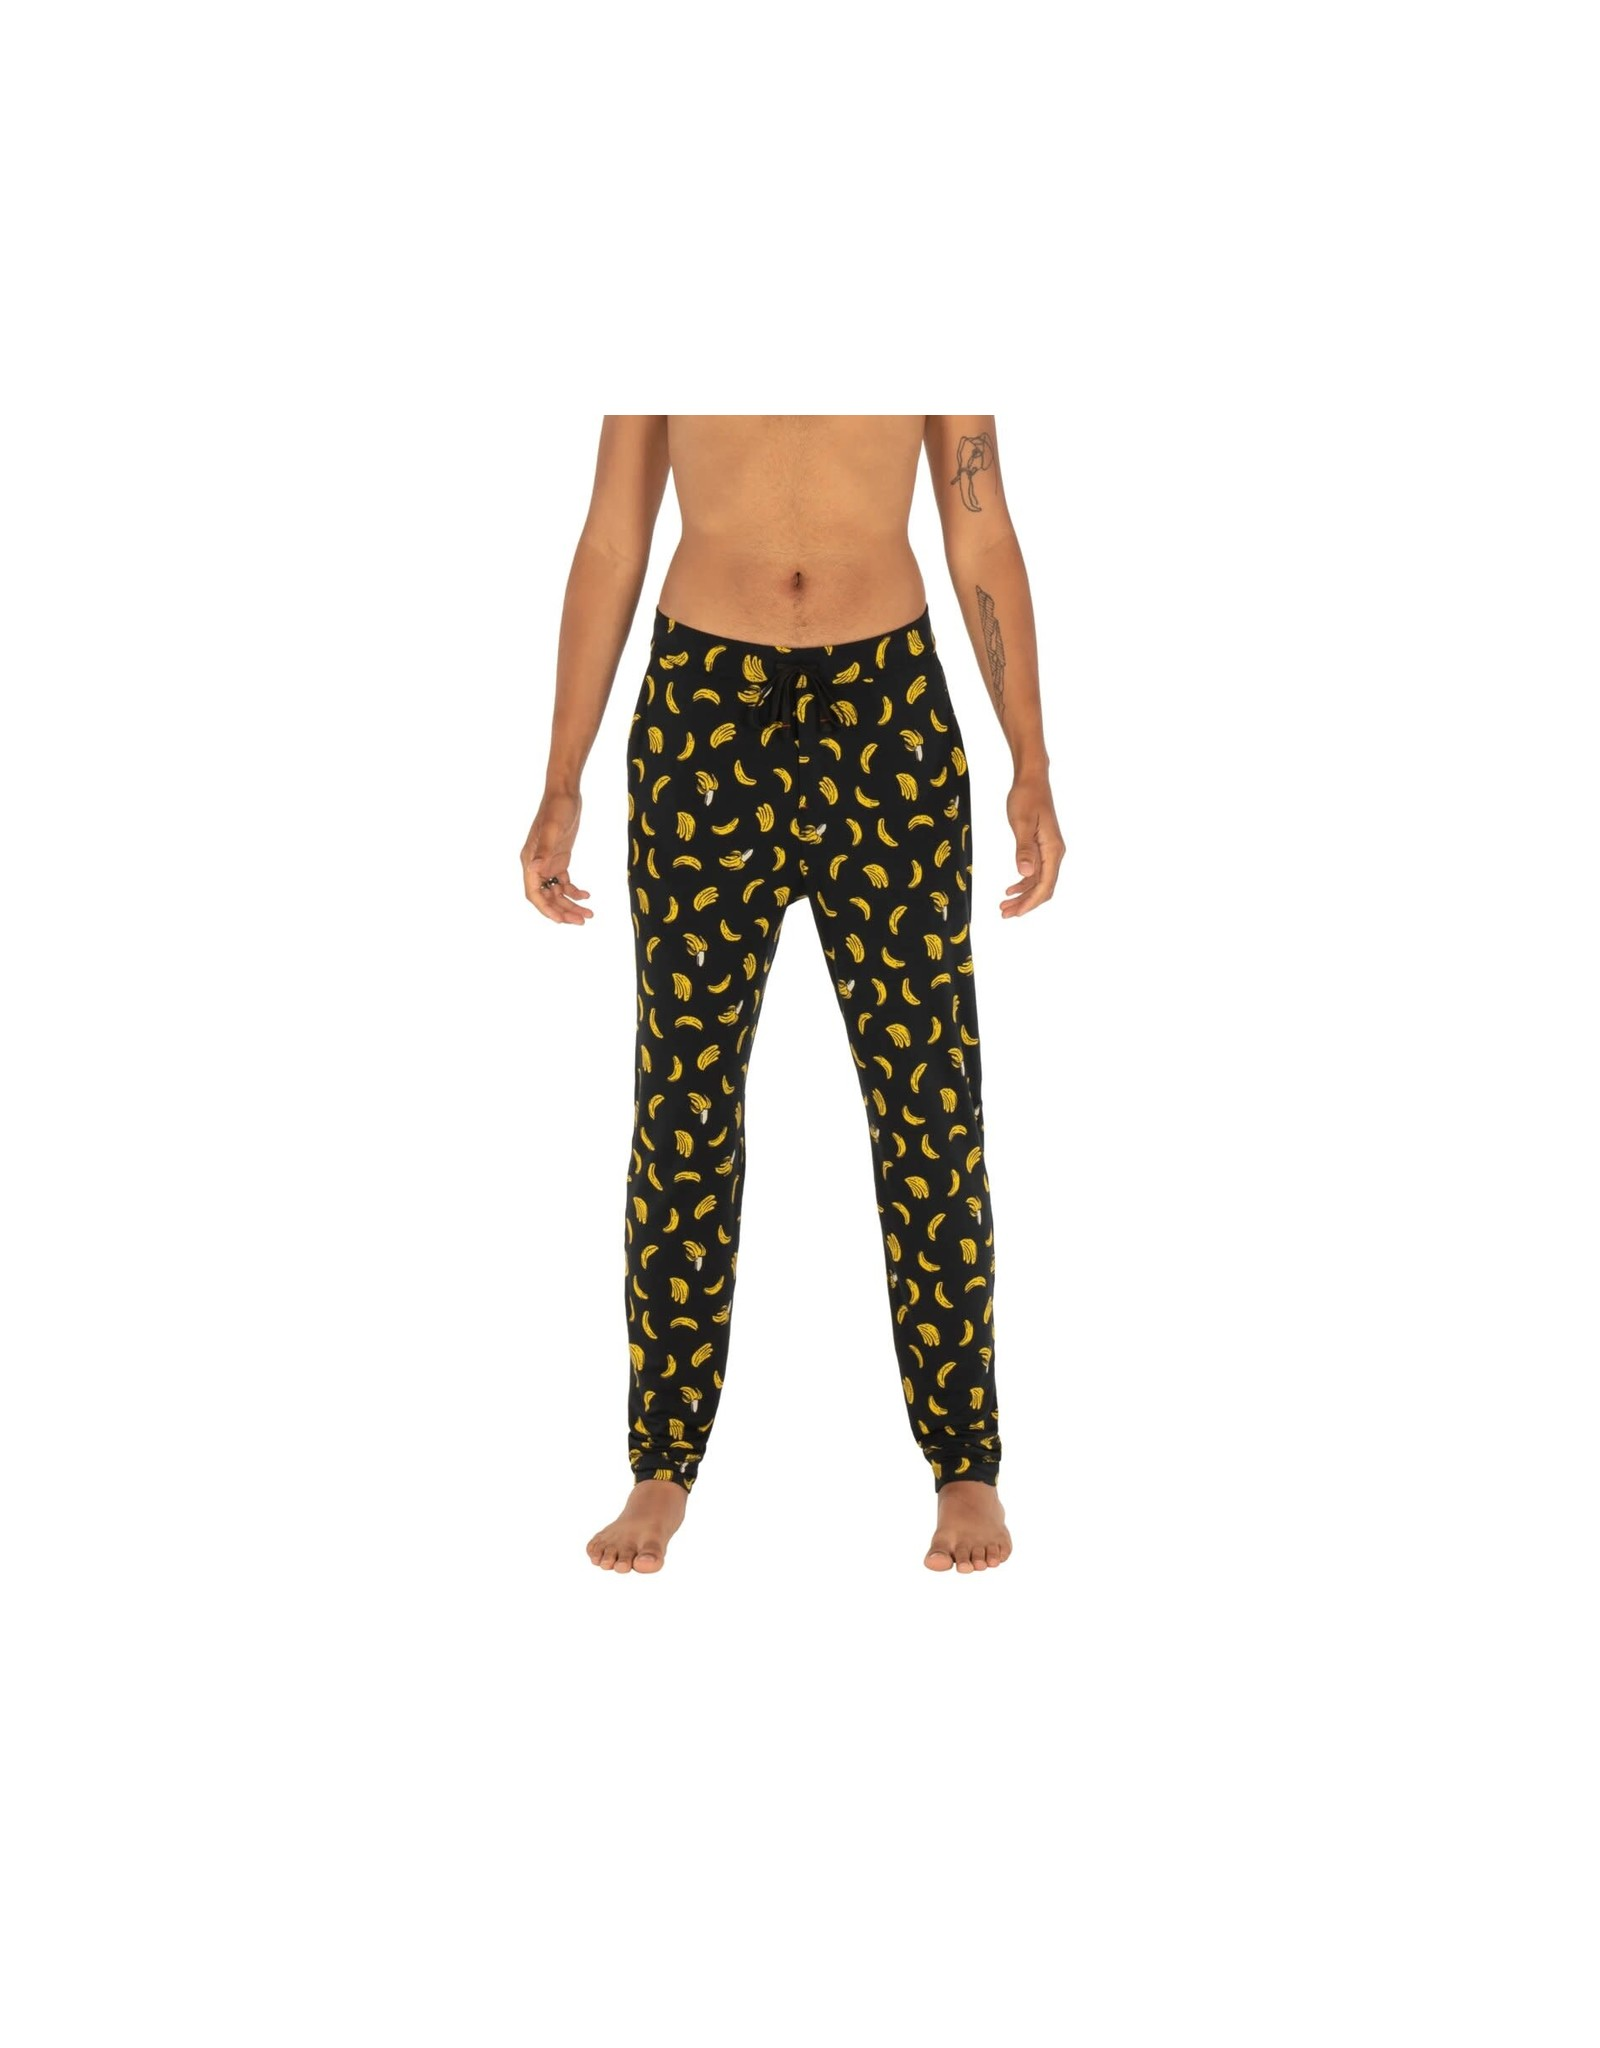 Saxx Snooze Pant Black Banana